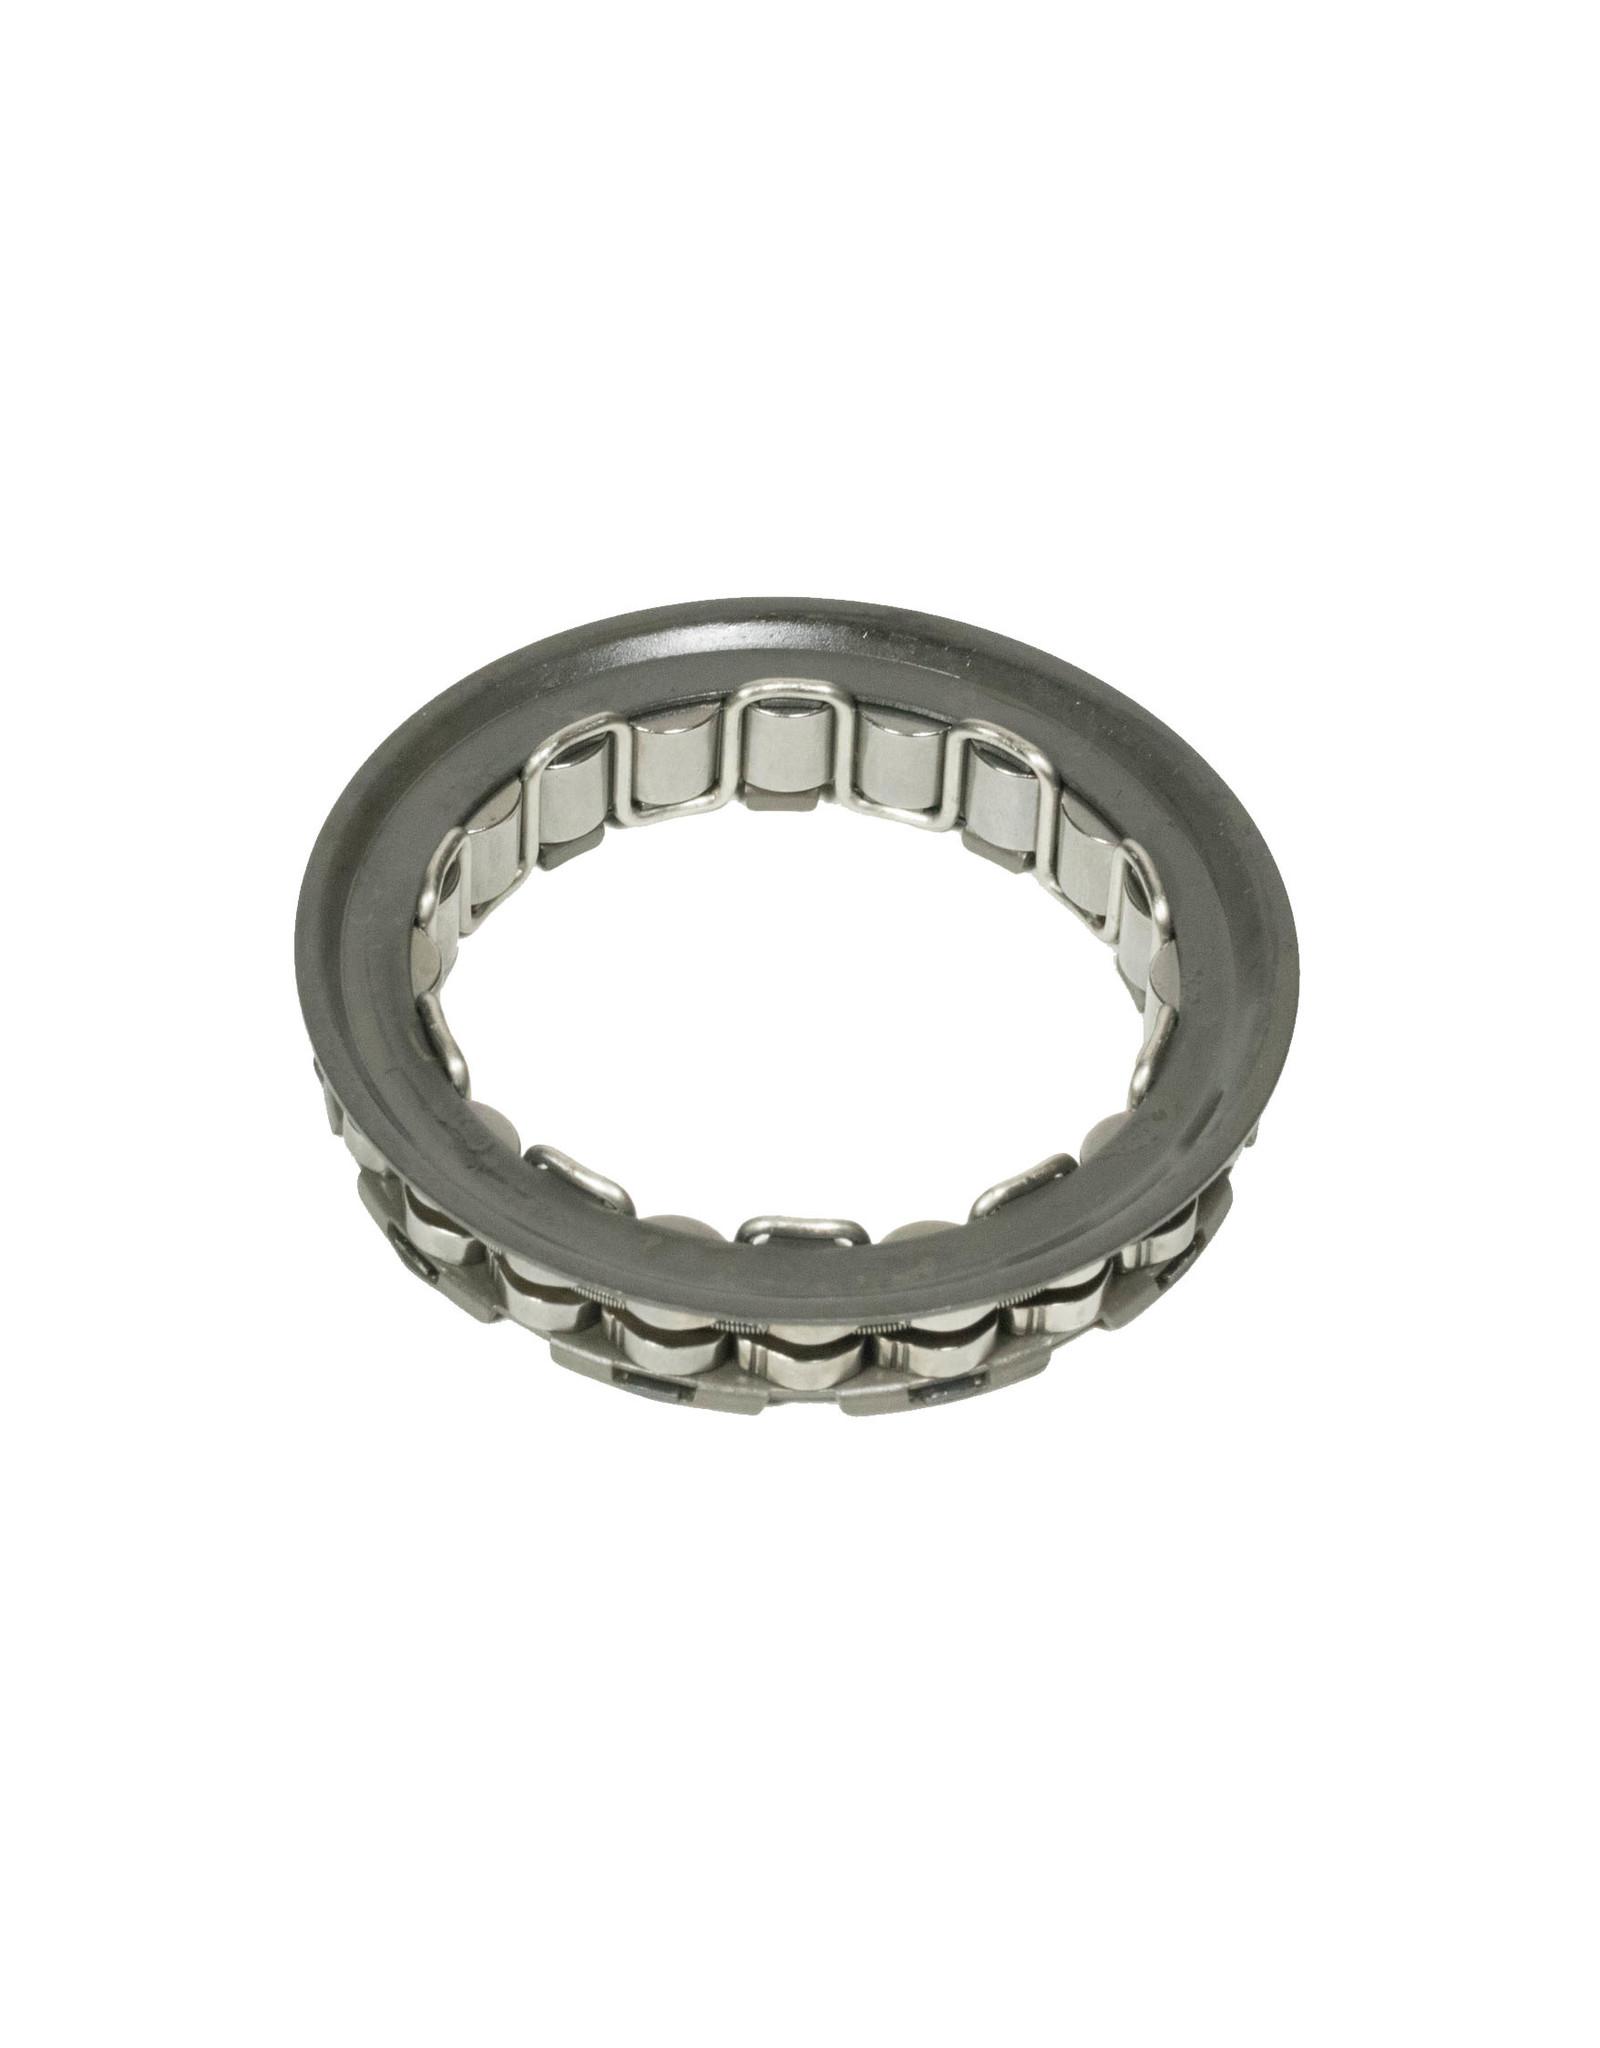 Aprilia Sprag Clutch Bearing (Fits all Vtwin Engines) AP0659110